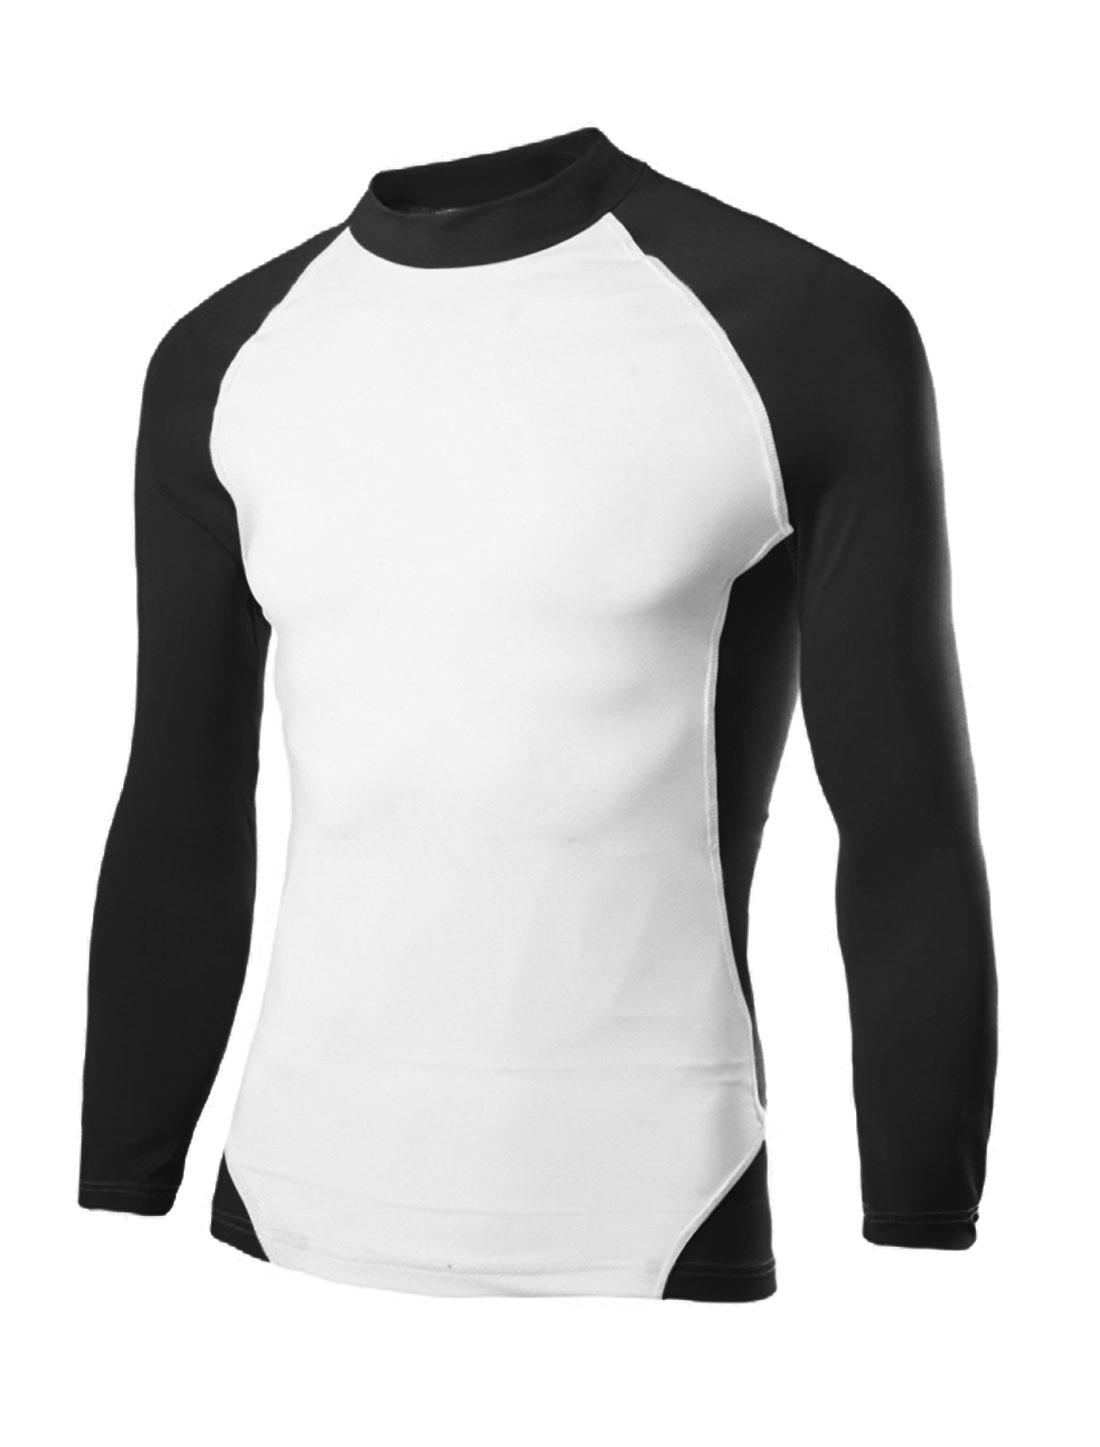 Men Contrast Color Moisture-Wicking Long Raglan Sleeves T-Shirt Black White M